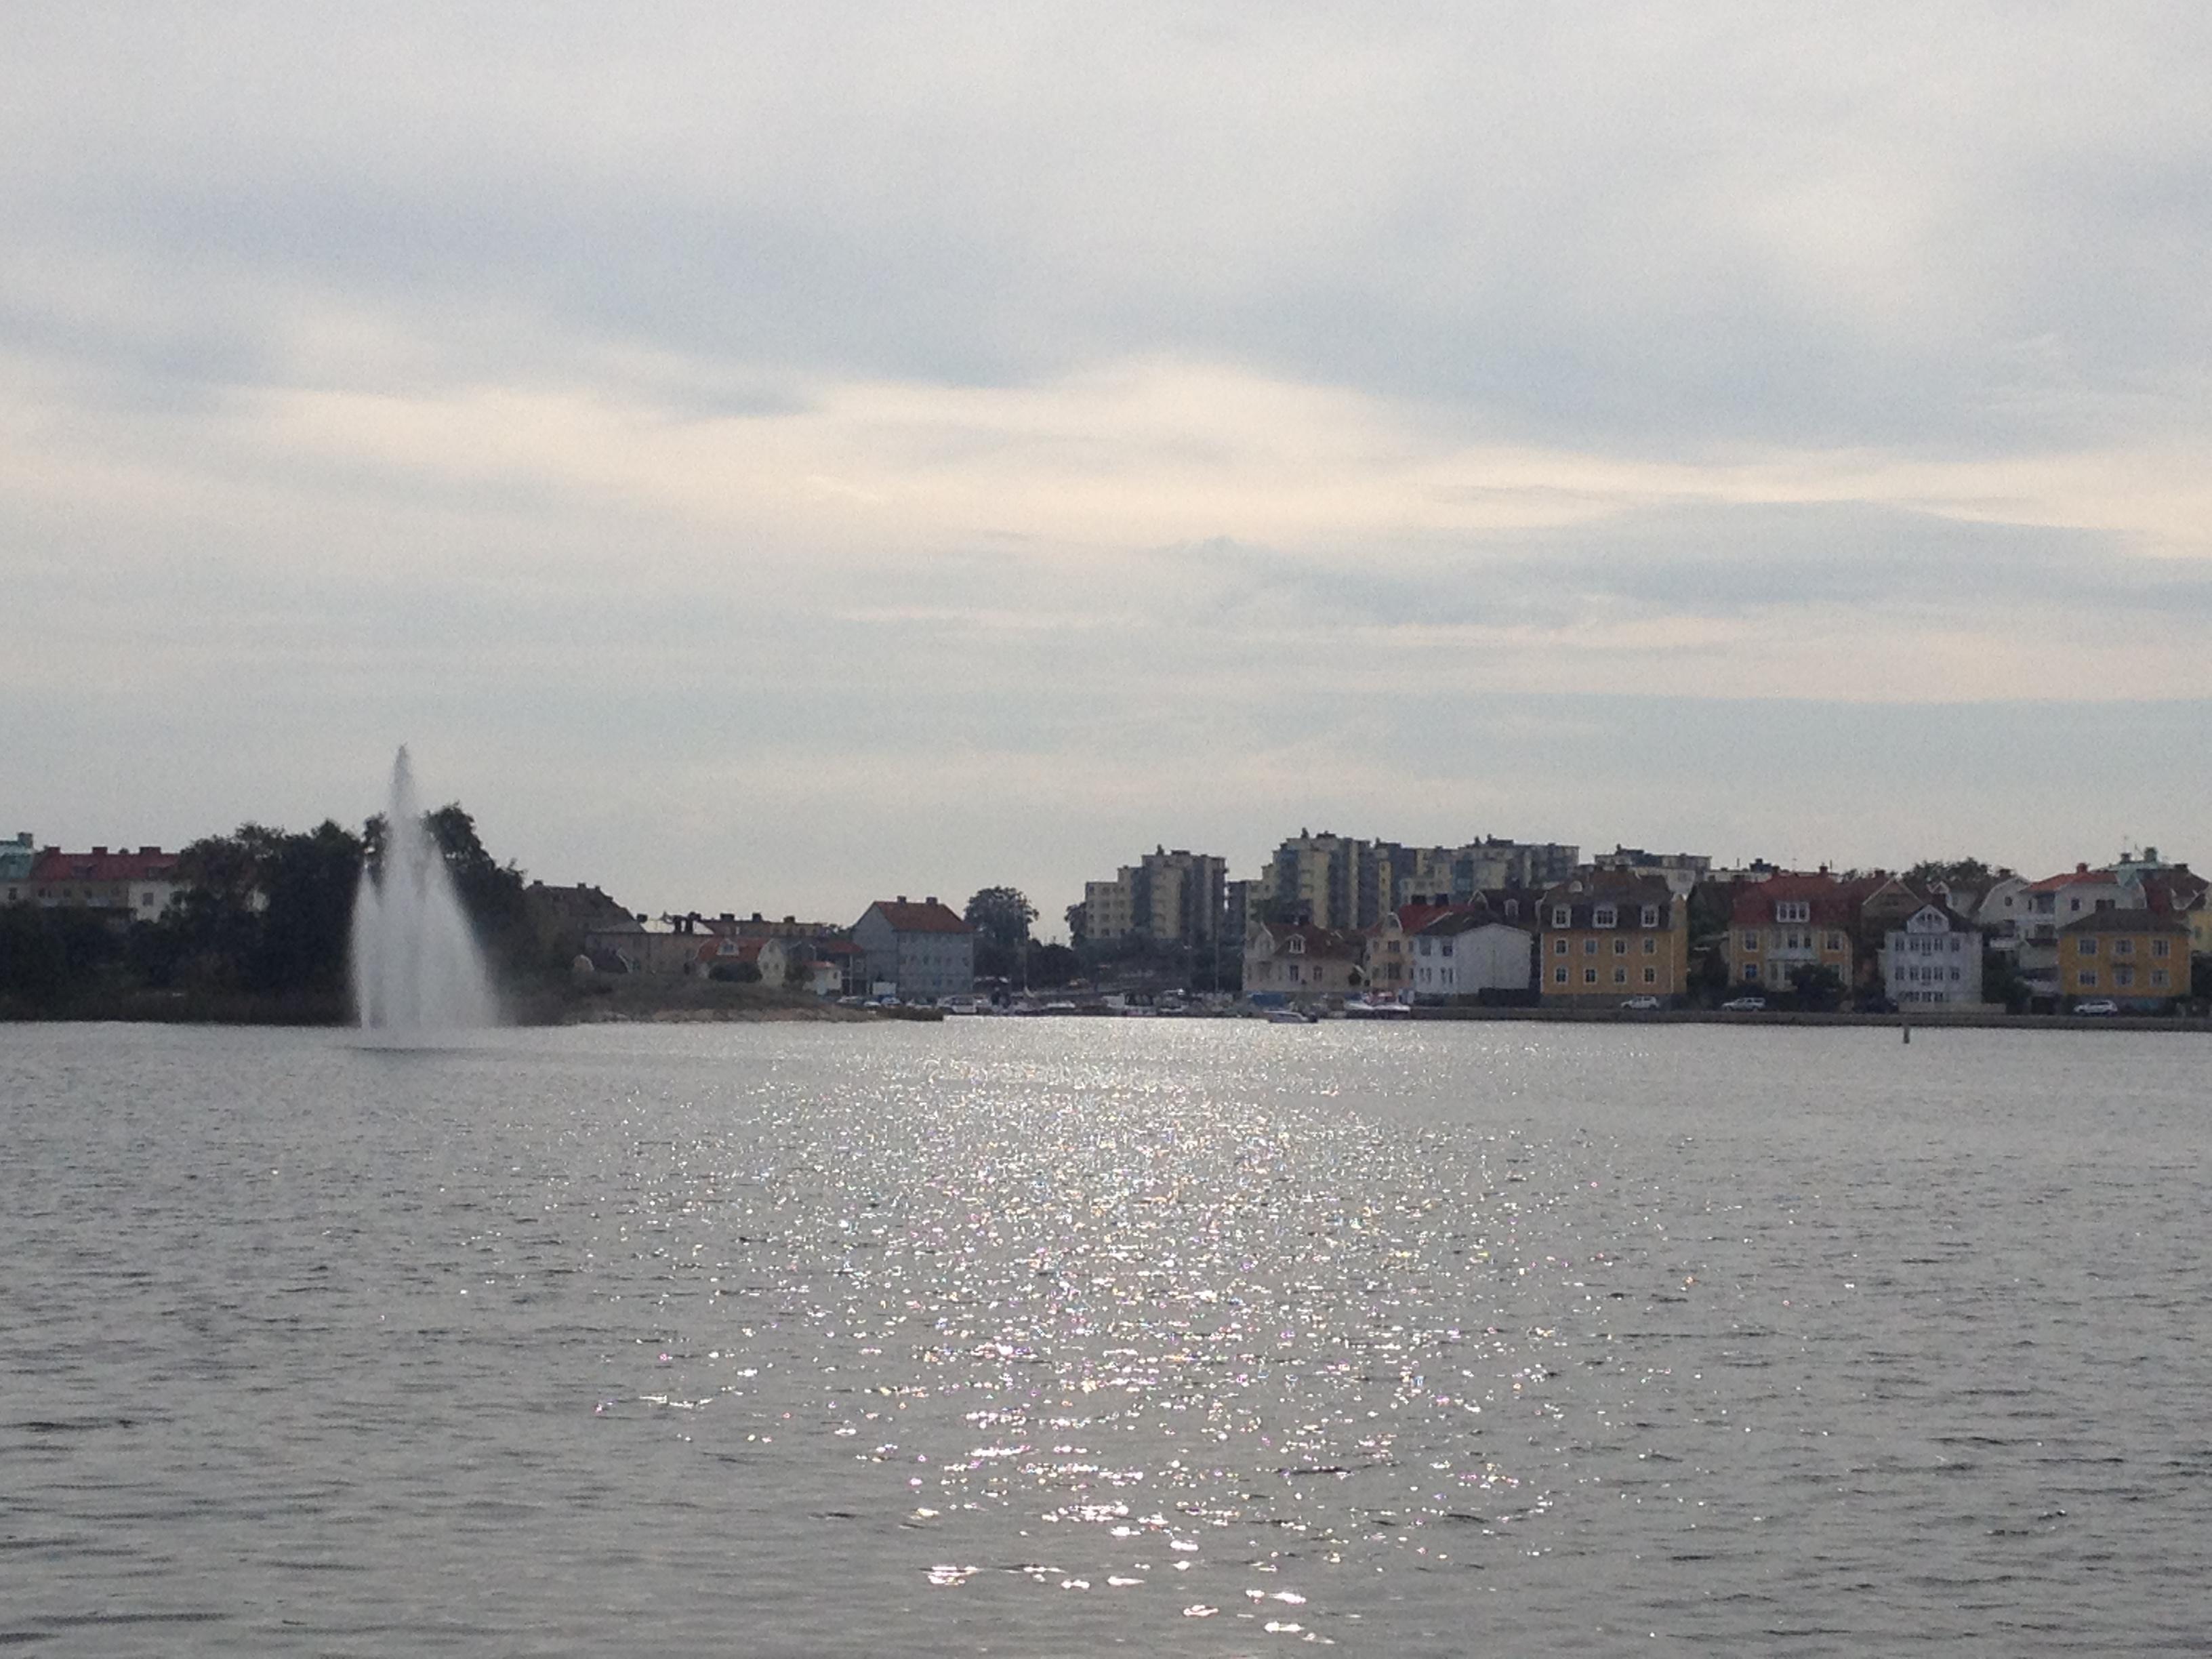 Morrum/Ronneby/Karlskroga